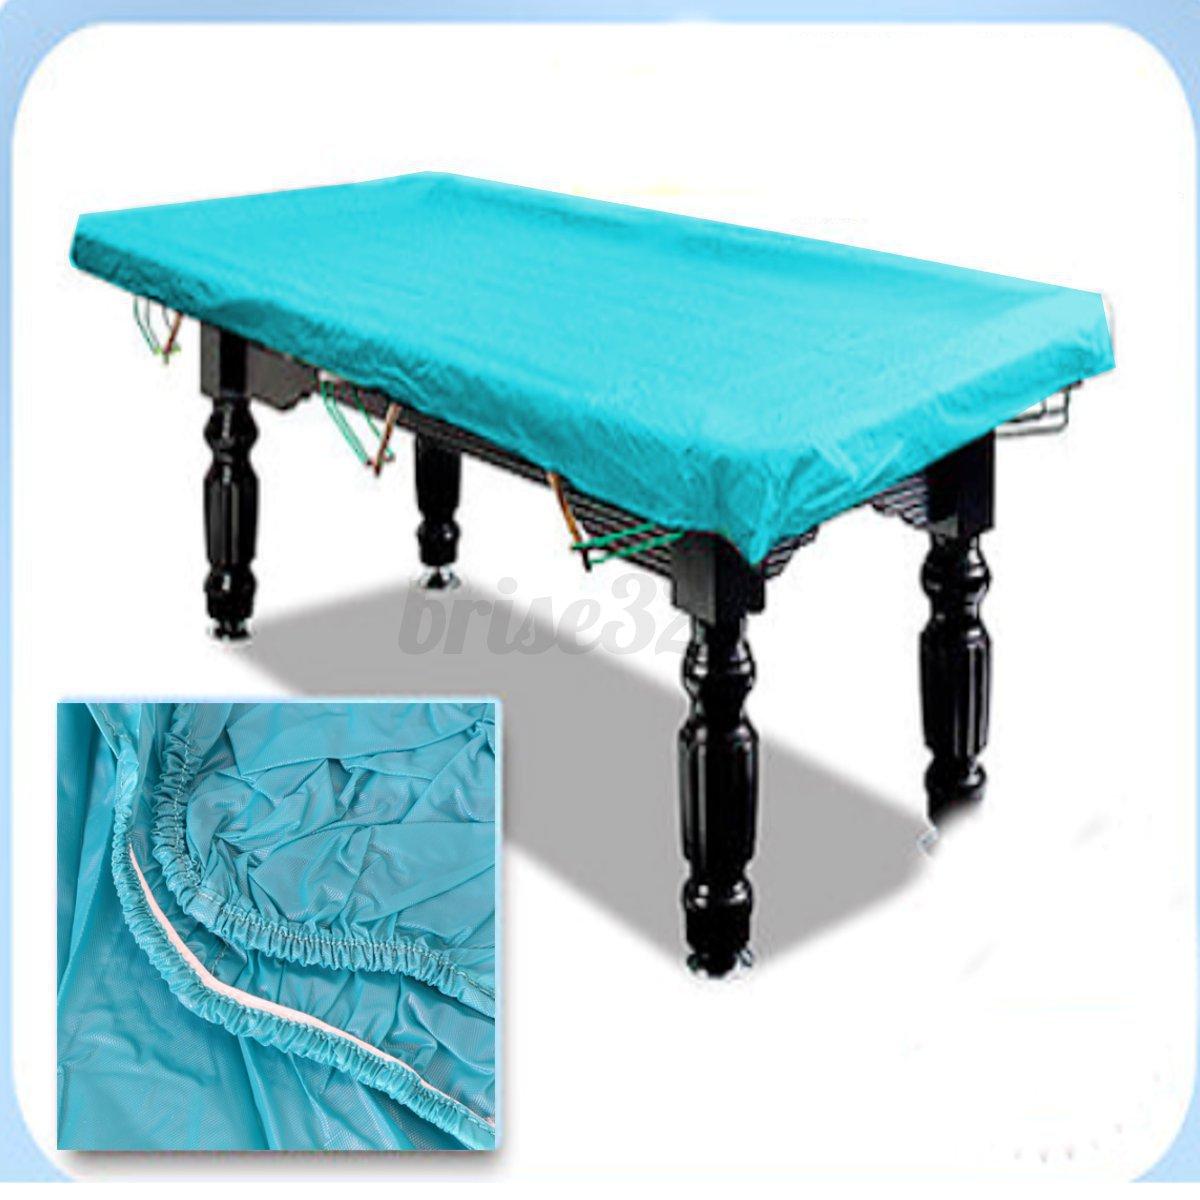 7ft 8ft rubber waterproof cover dustproof cloth for pool snooker billiard table ebay. Black Bedroom Furniture Sets. Home Design Ideas